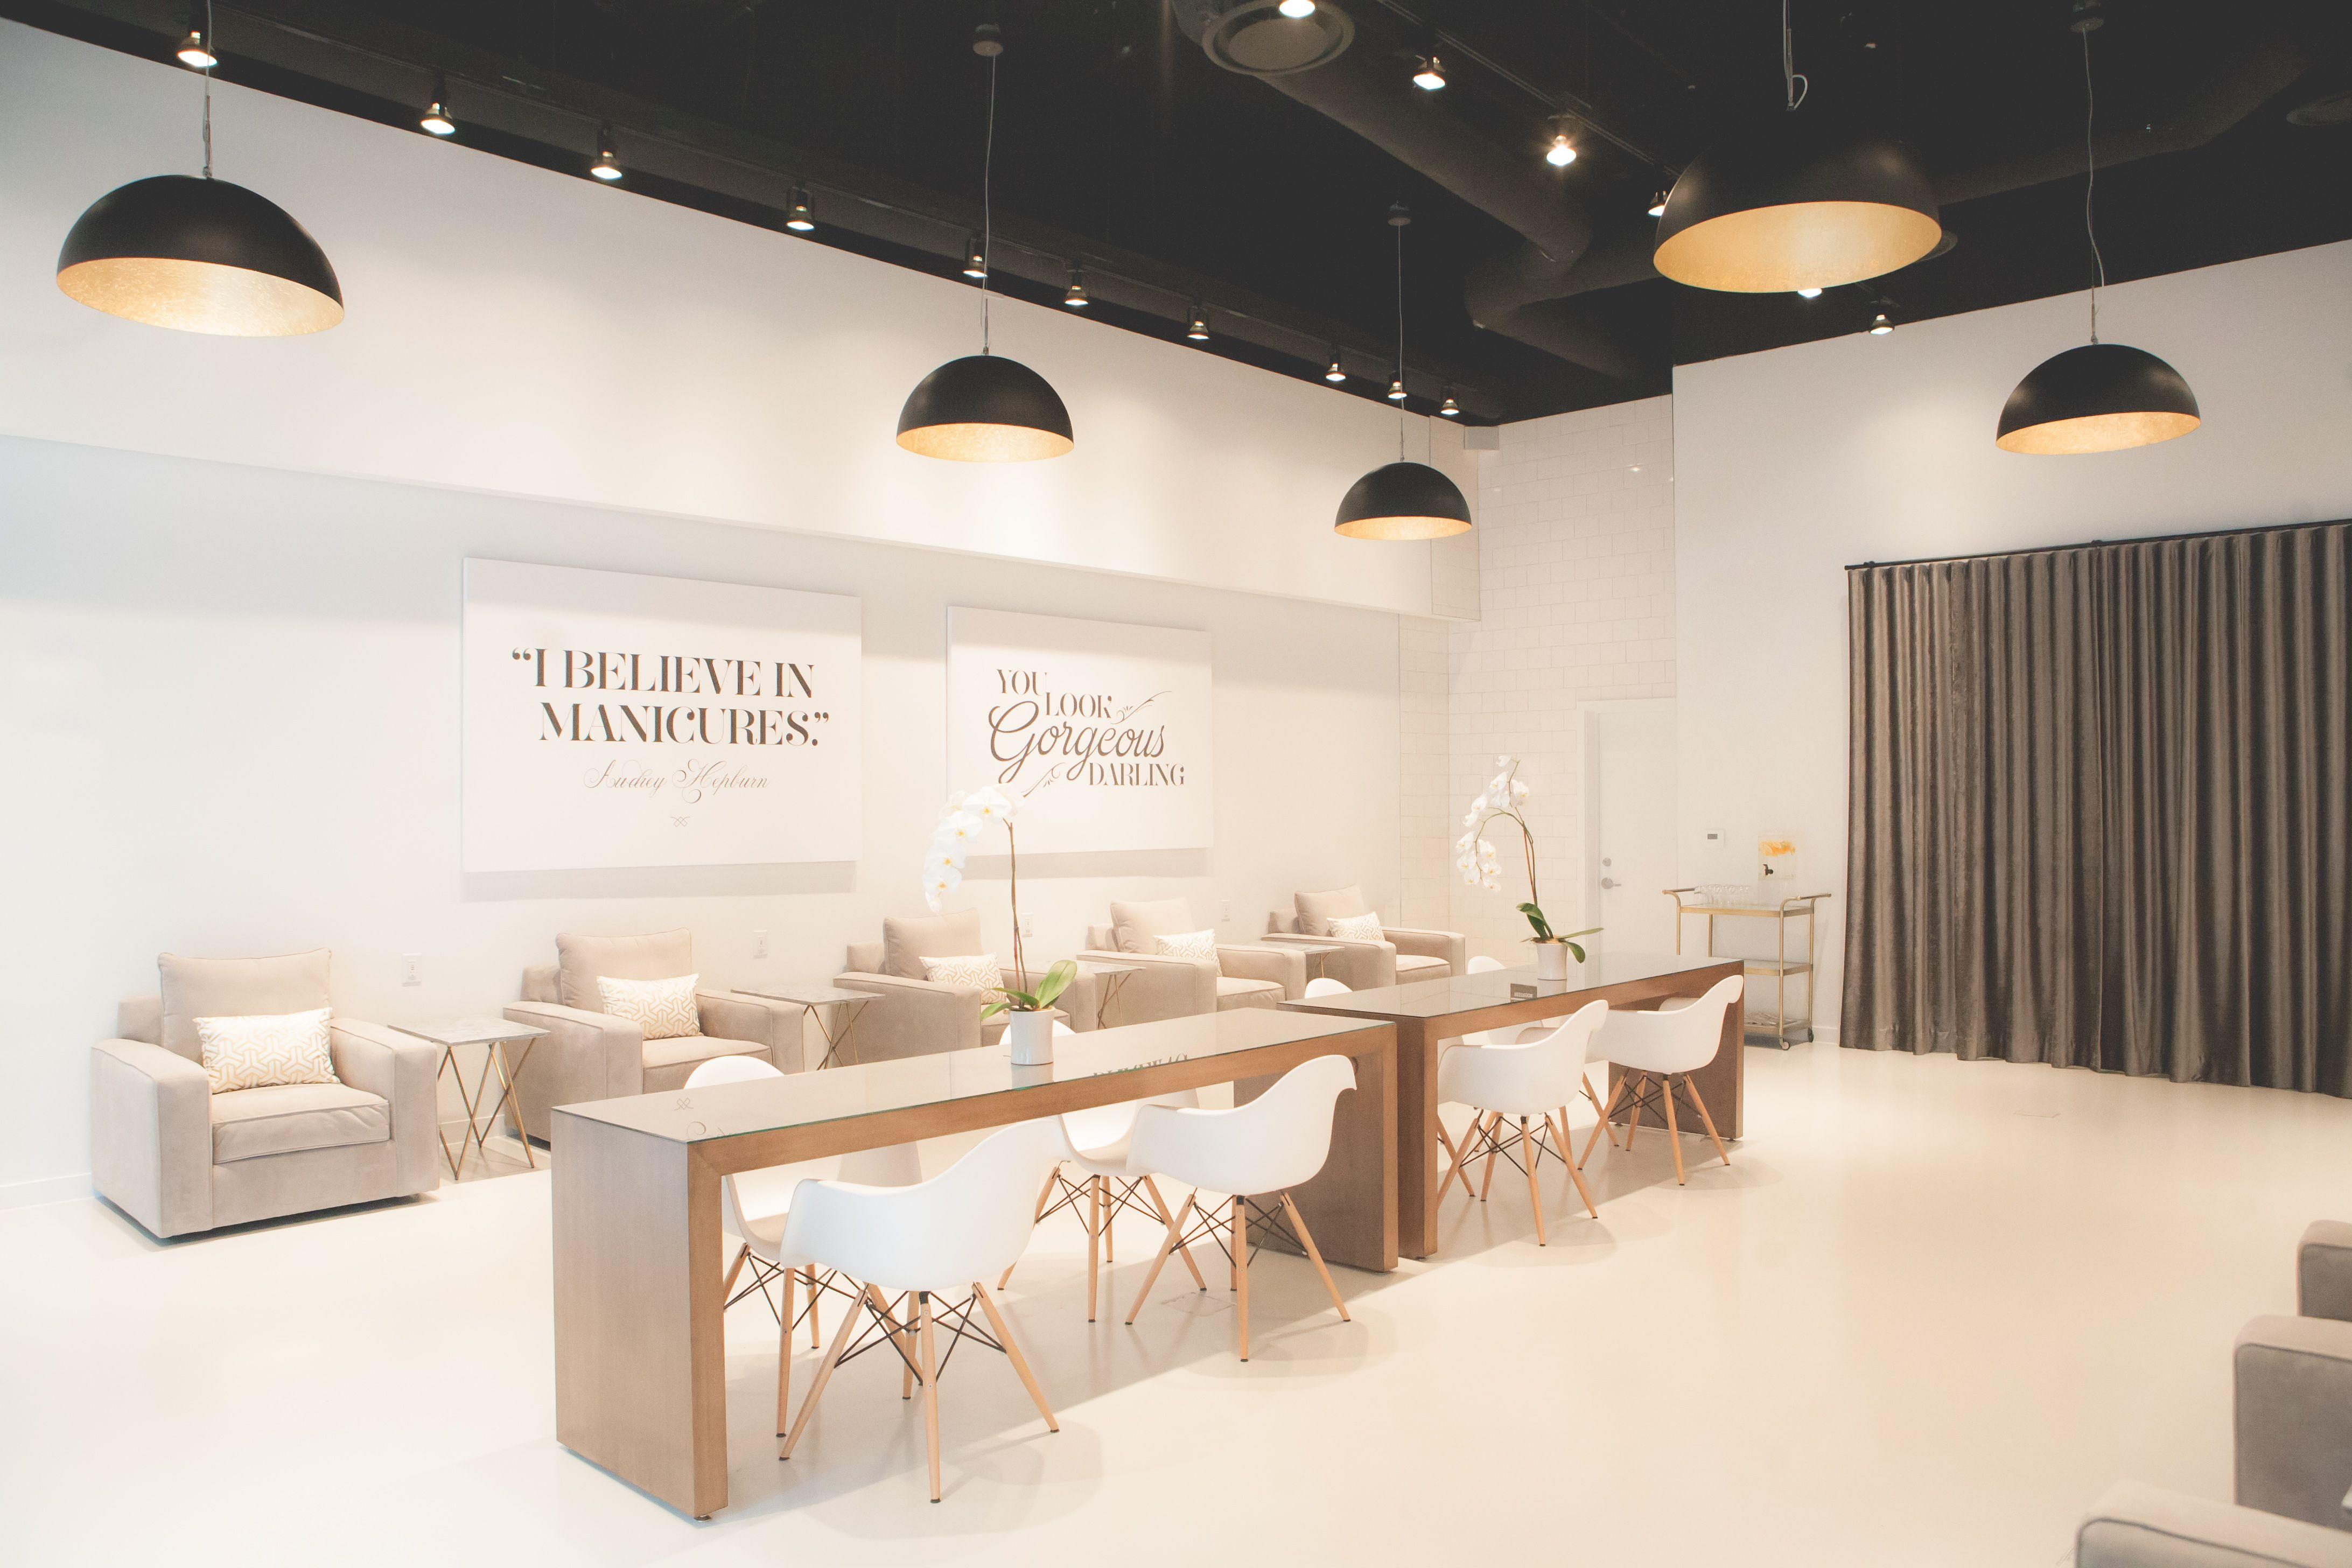 LACQUER modern nail salon in downtown Austin TX ilovelacquer  ilovelacquer in 2019  Modern